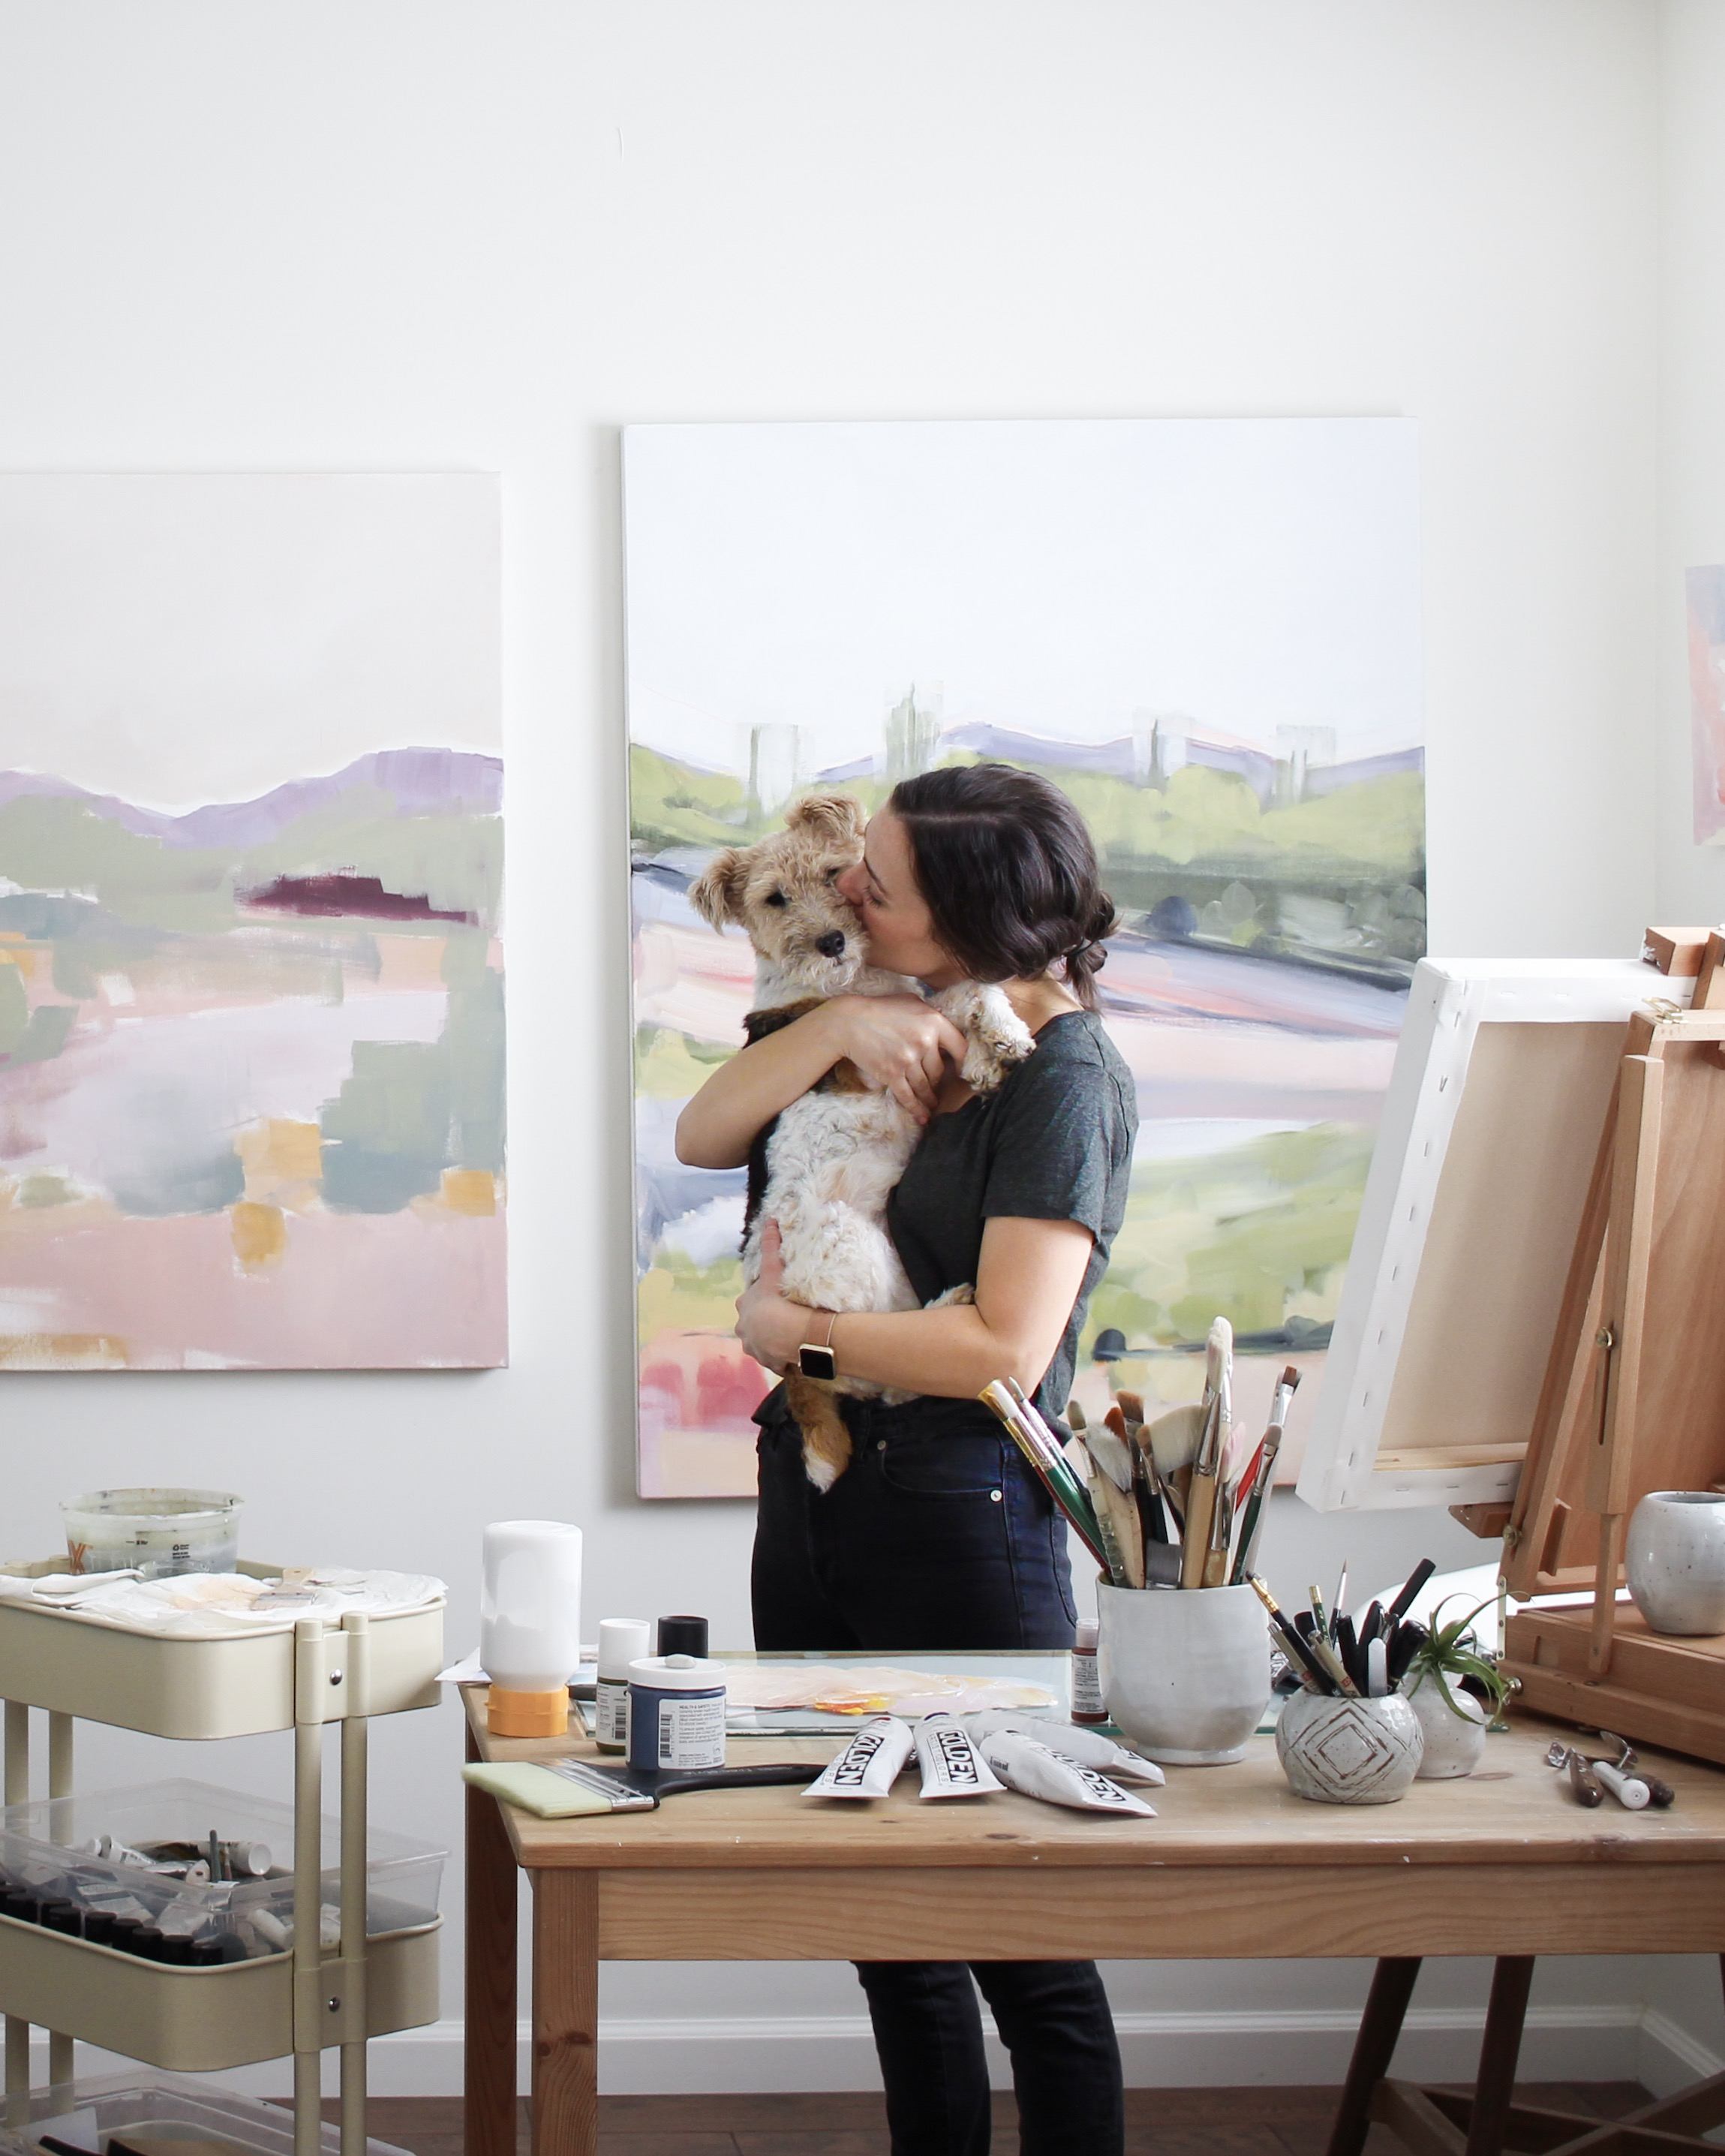 Where Makers Make_LaurieAnne Gonzalez_Art Studio Tour_4.jpg